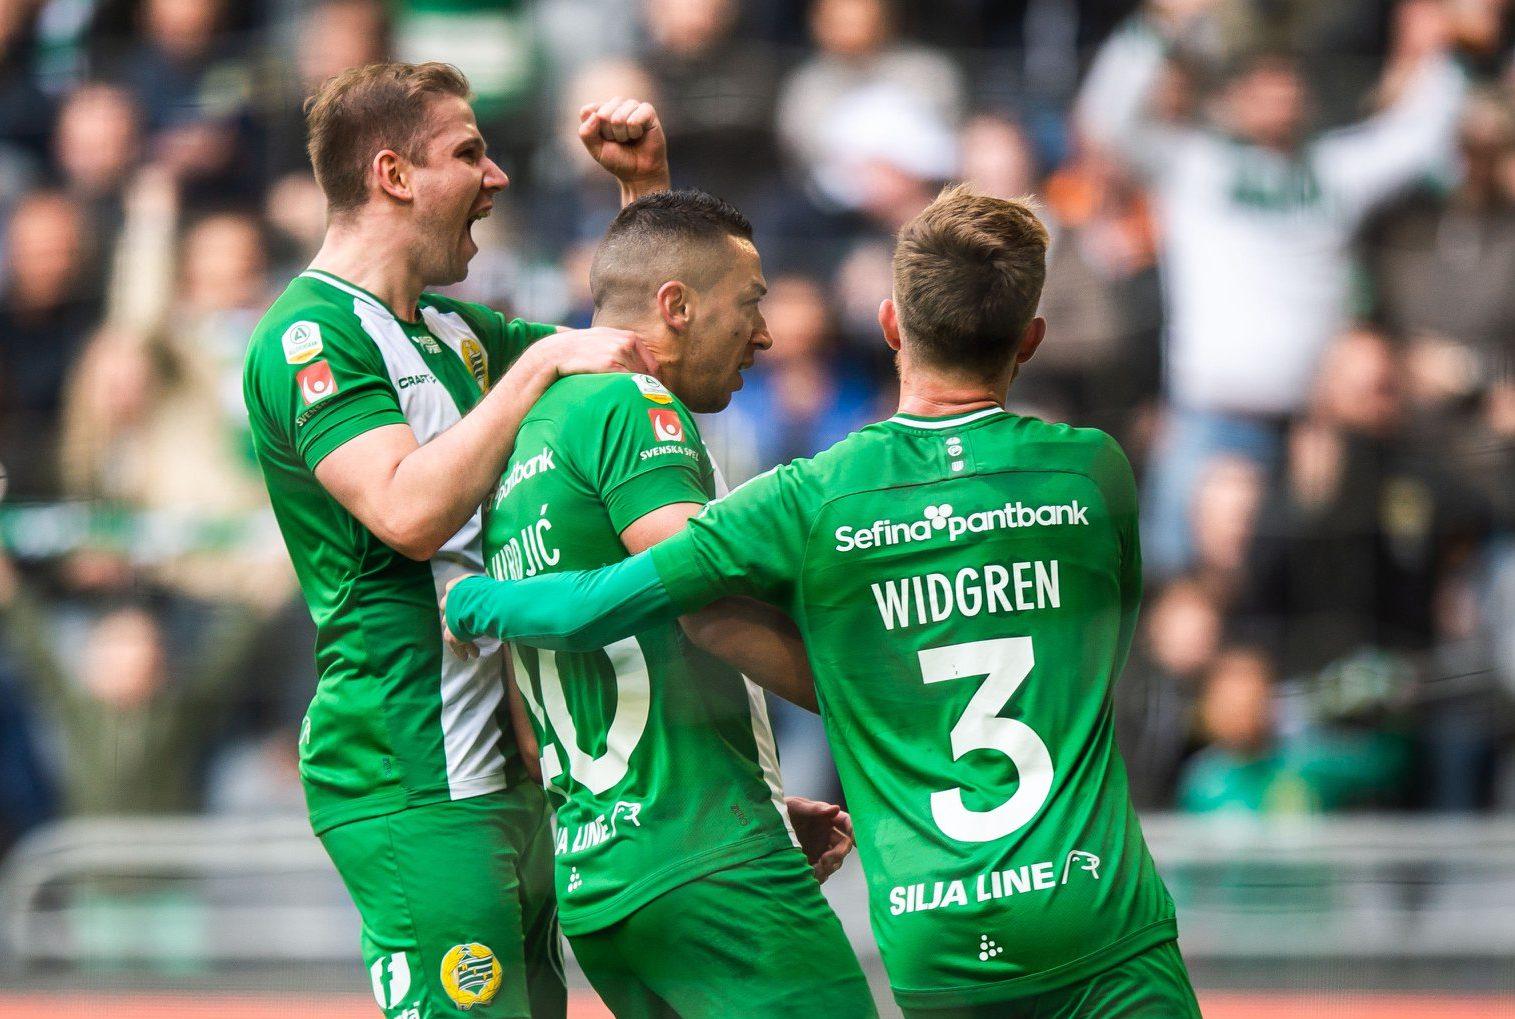 Svezia Allsvenskan, Hammarby-Norrkoping 27 maggio: entrambe sono in gran forma